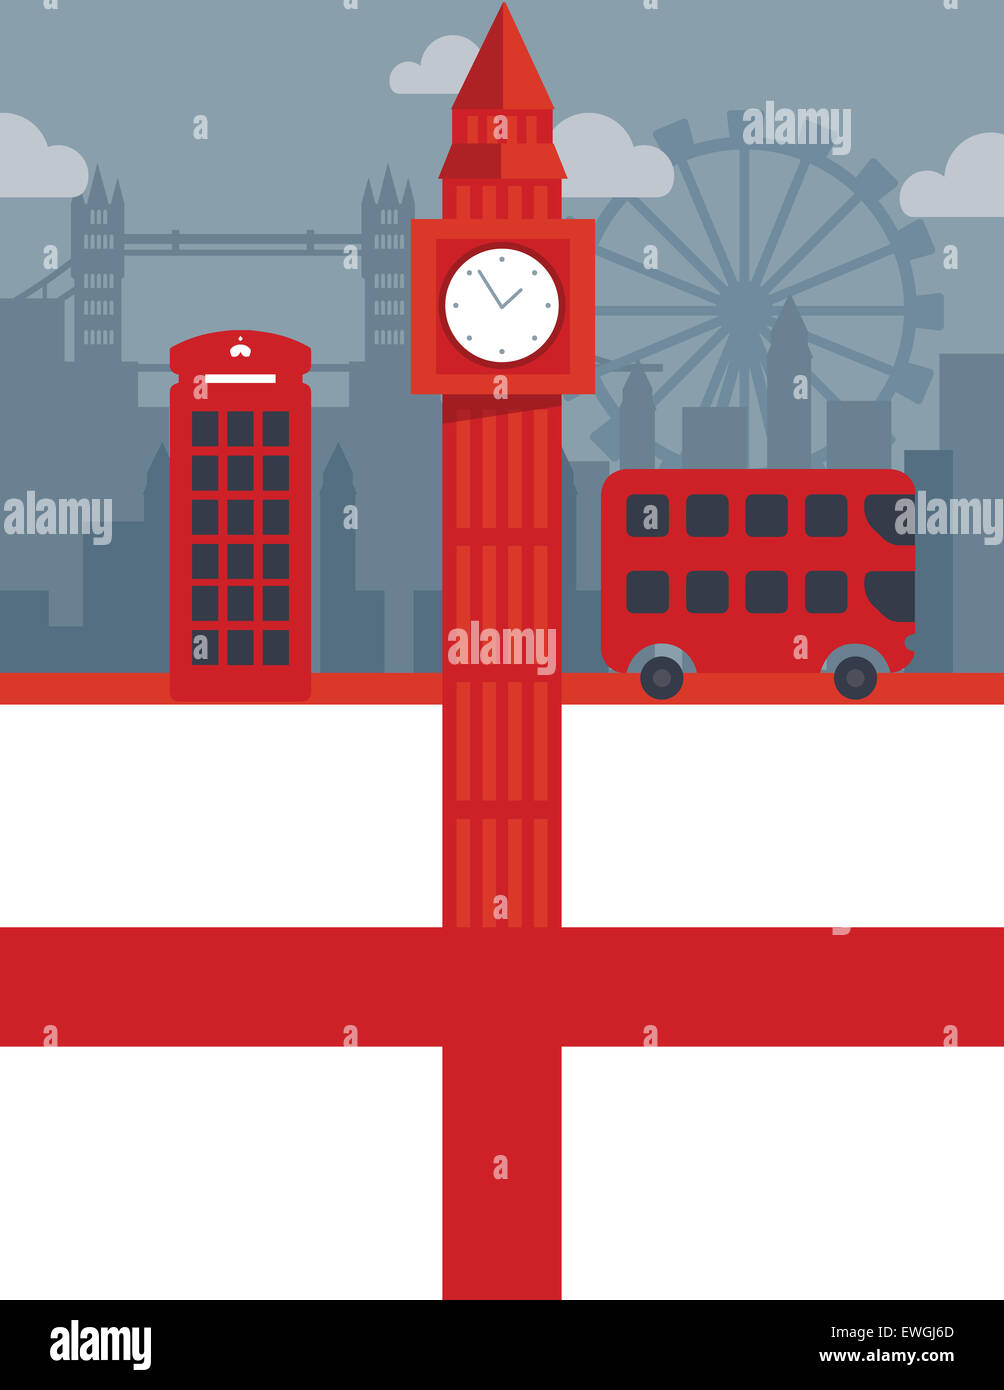 Illustrative collage representing famous historical landmarks of London, England - Stock Image